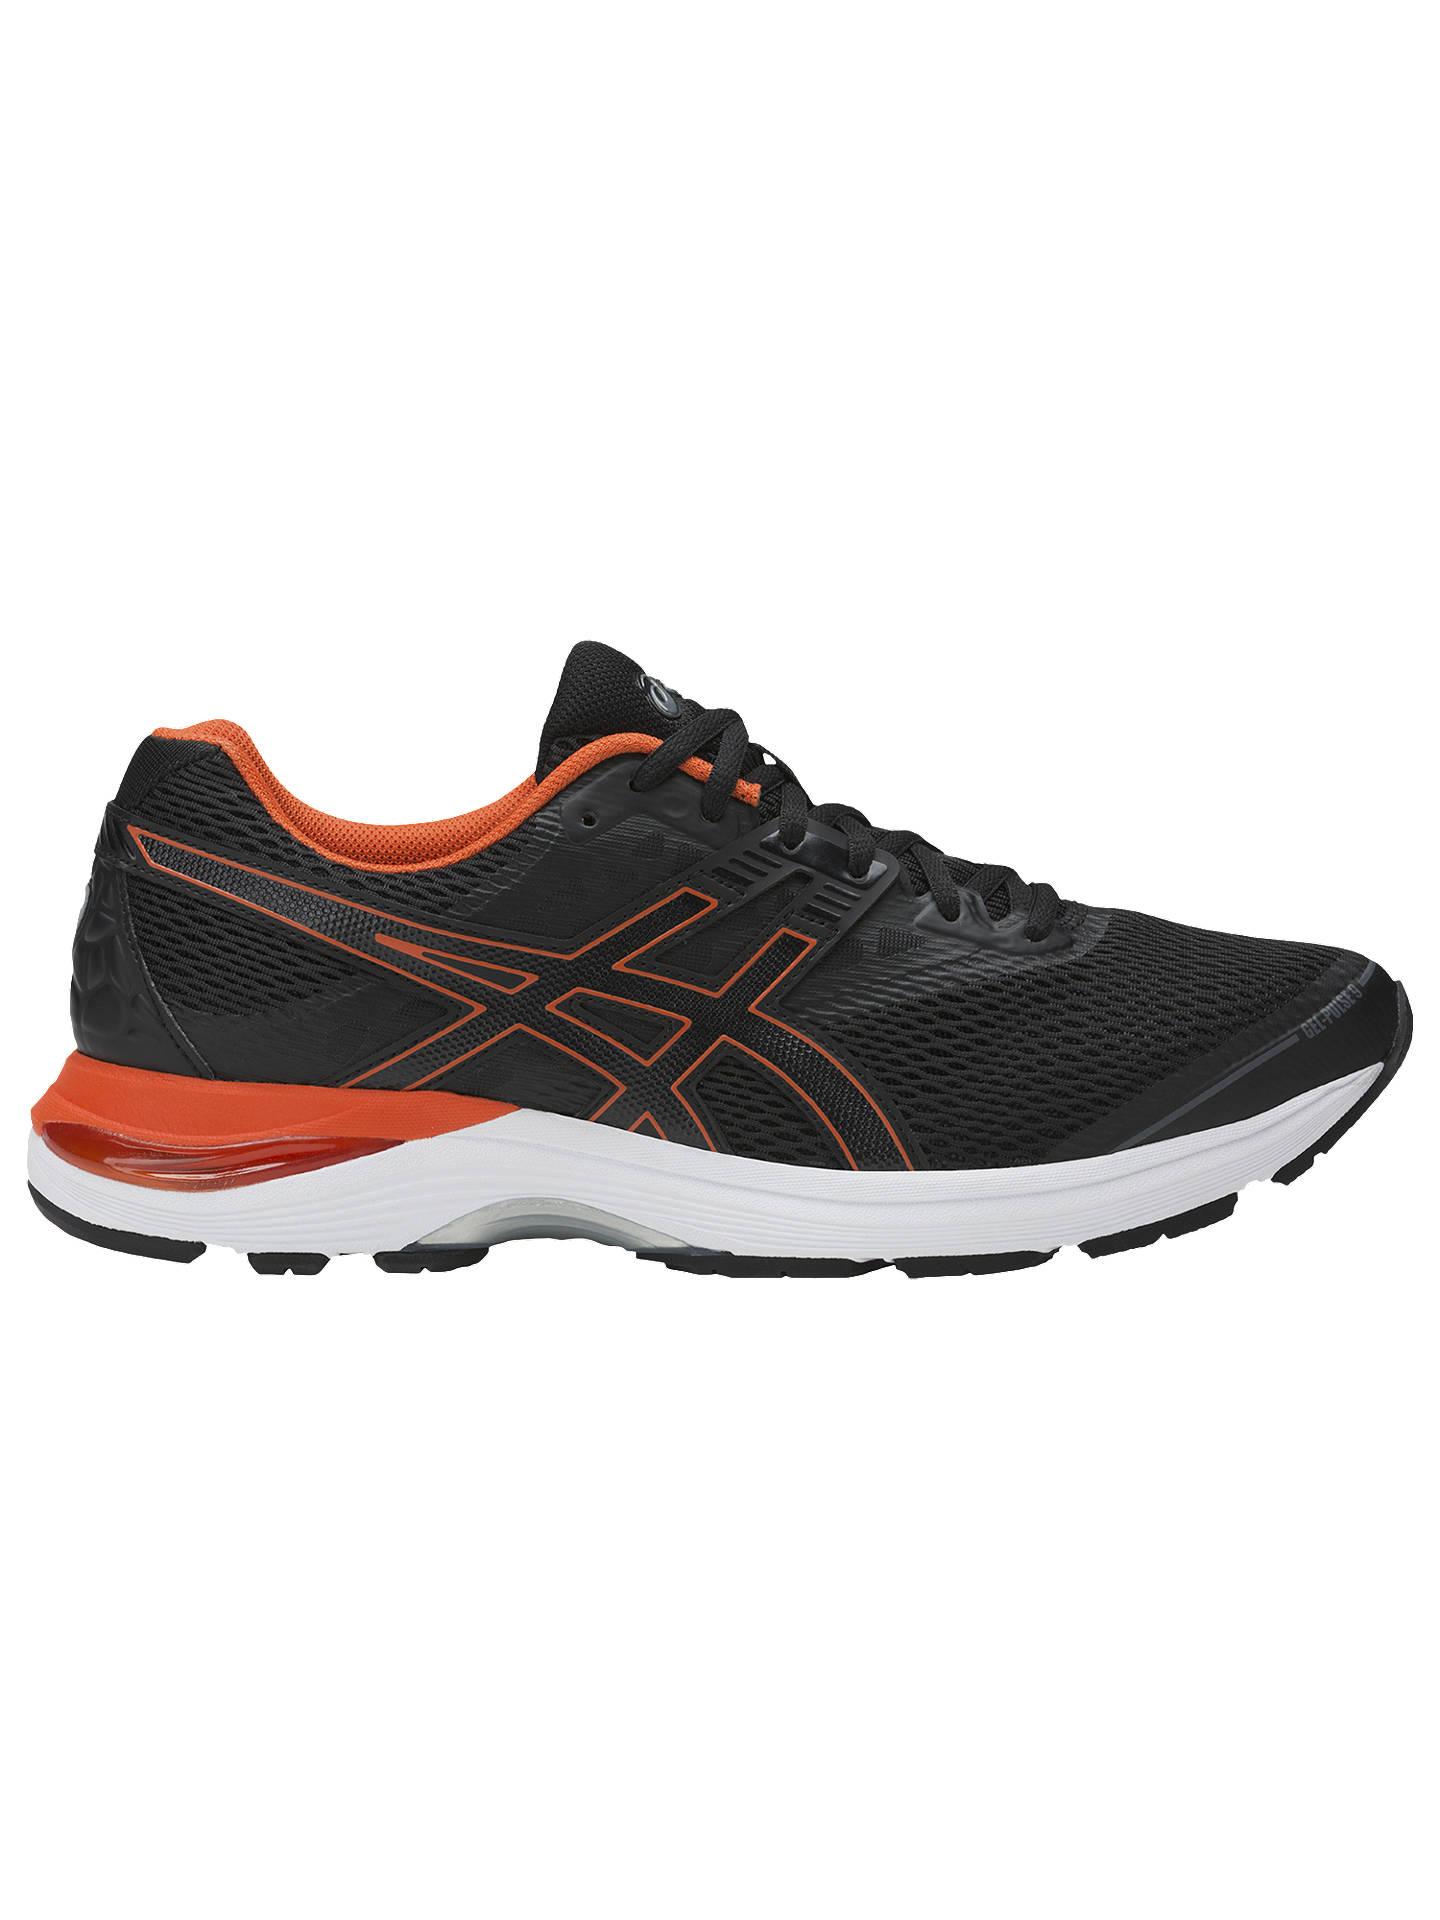 ASICS Men's Gel Pulse 9 Running Shoes